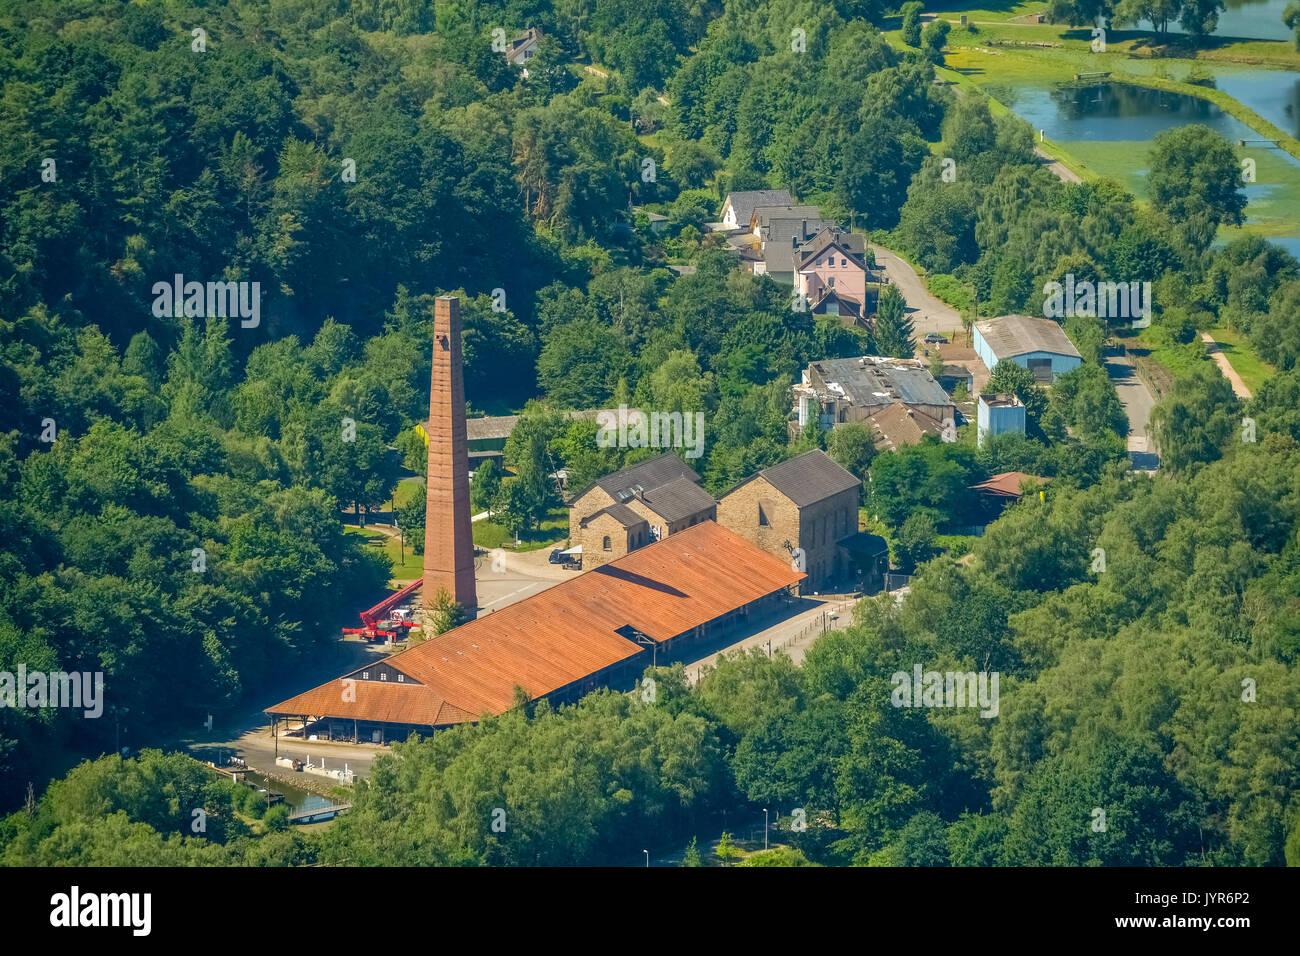 LWL Industrial Museum Nightingale Colliery, Cafe Nightingale, Muttental, Muttentalstraße, Witten, Ruhrgebiet, North Rhine-Westphalia, Germany, Europe, - Stock Image